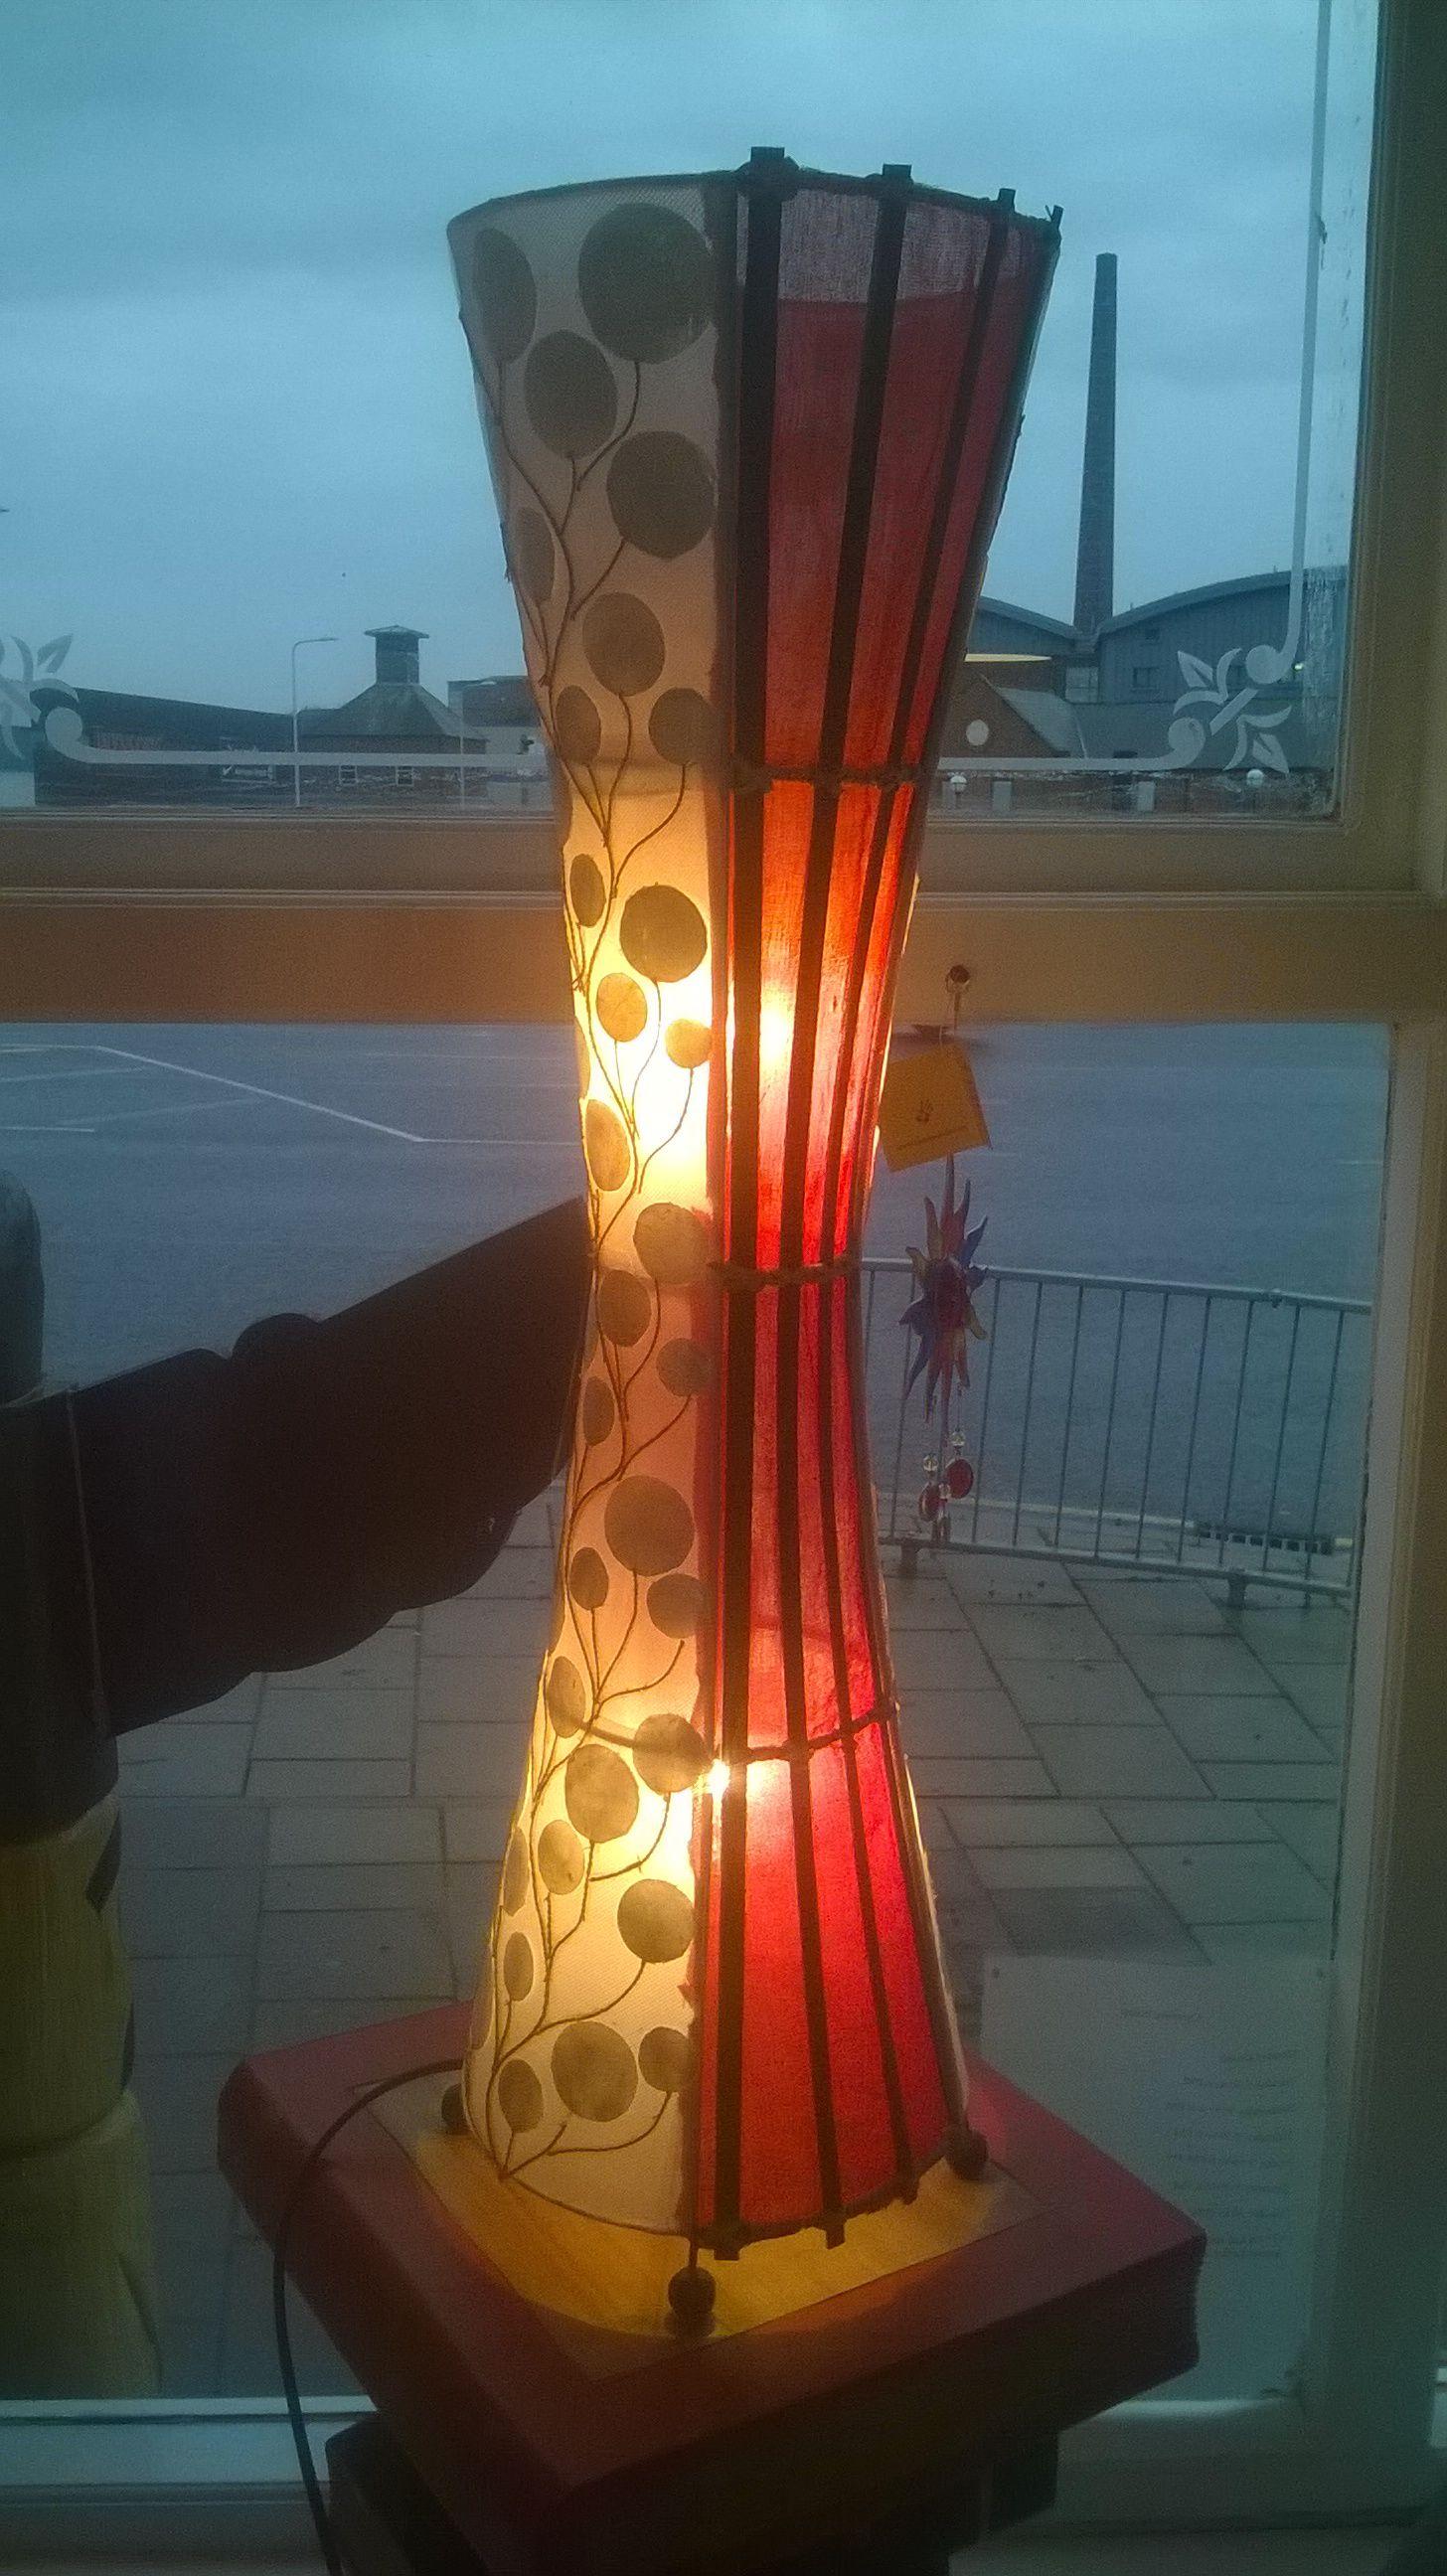 subdued lighting. Testy Tasty Tall Floor Lamp, Not To Bright, Just Right For Subdued Lighting. Lighting